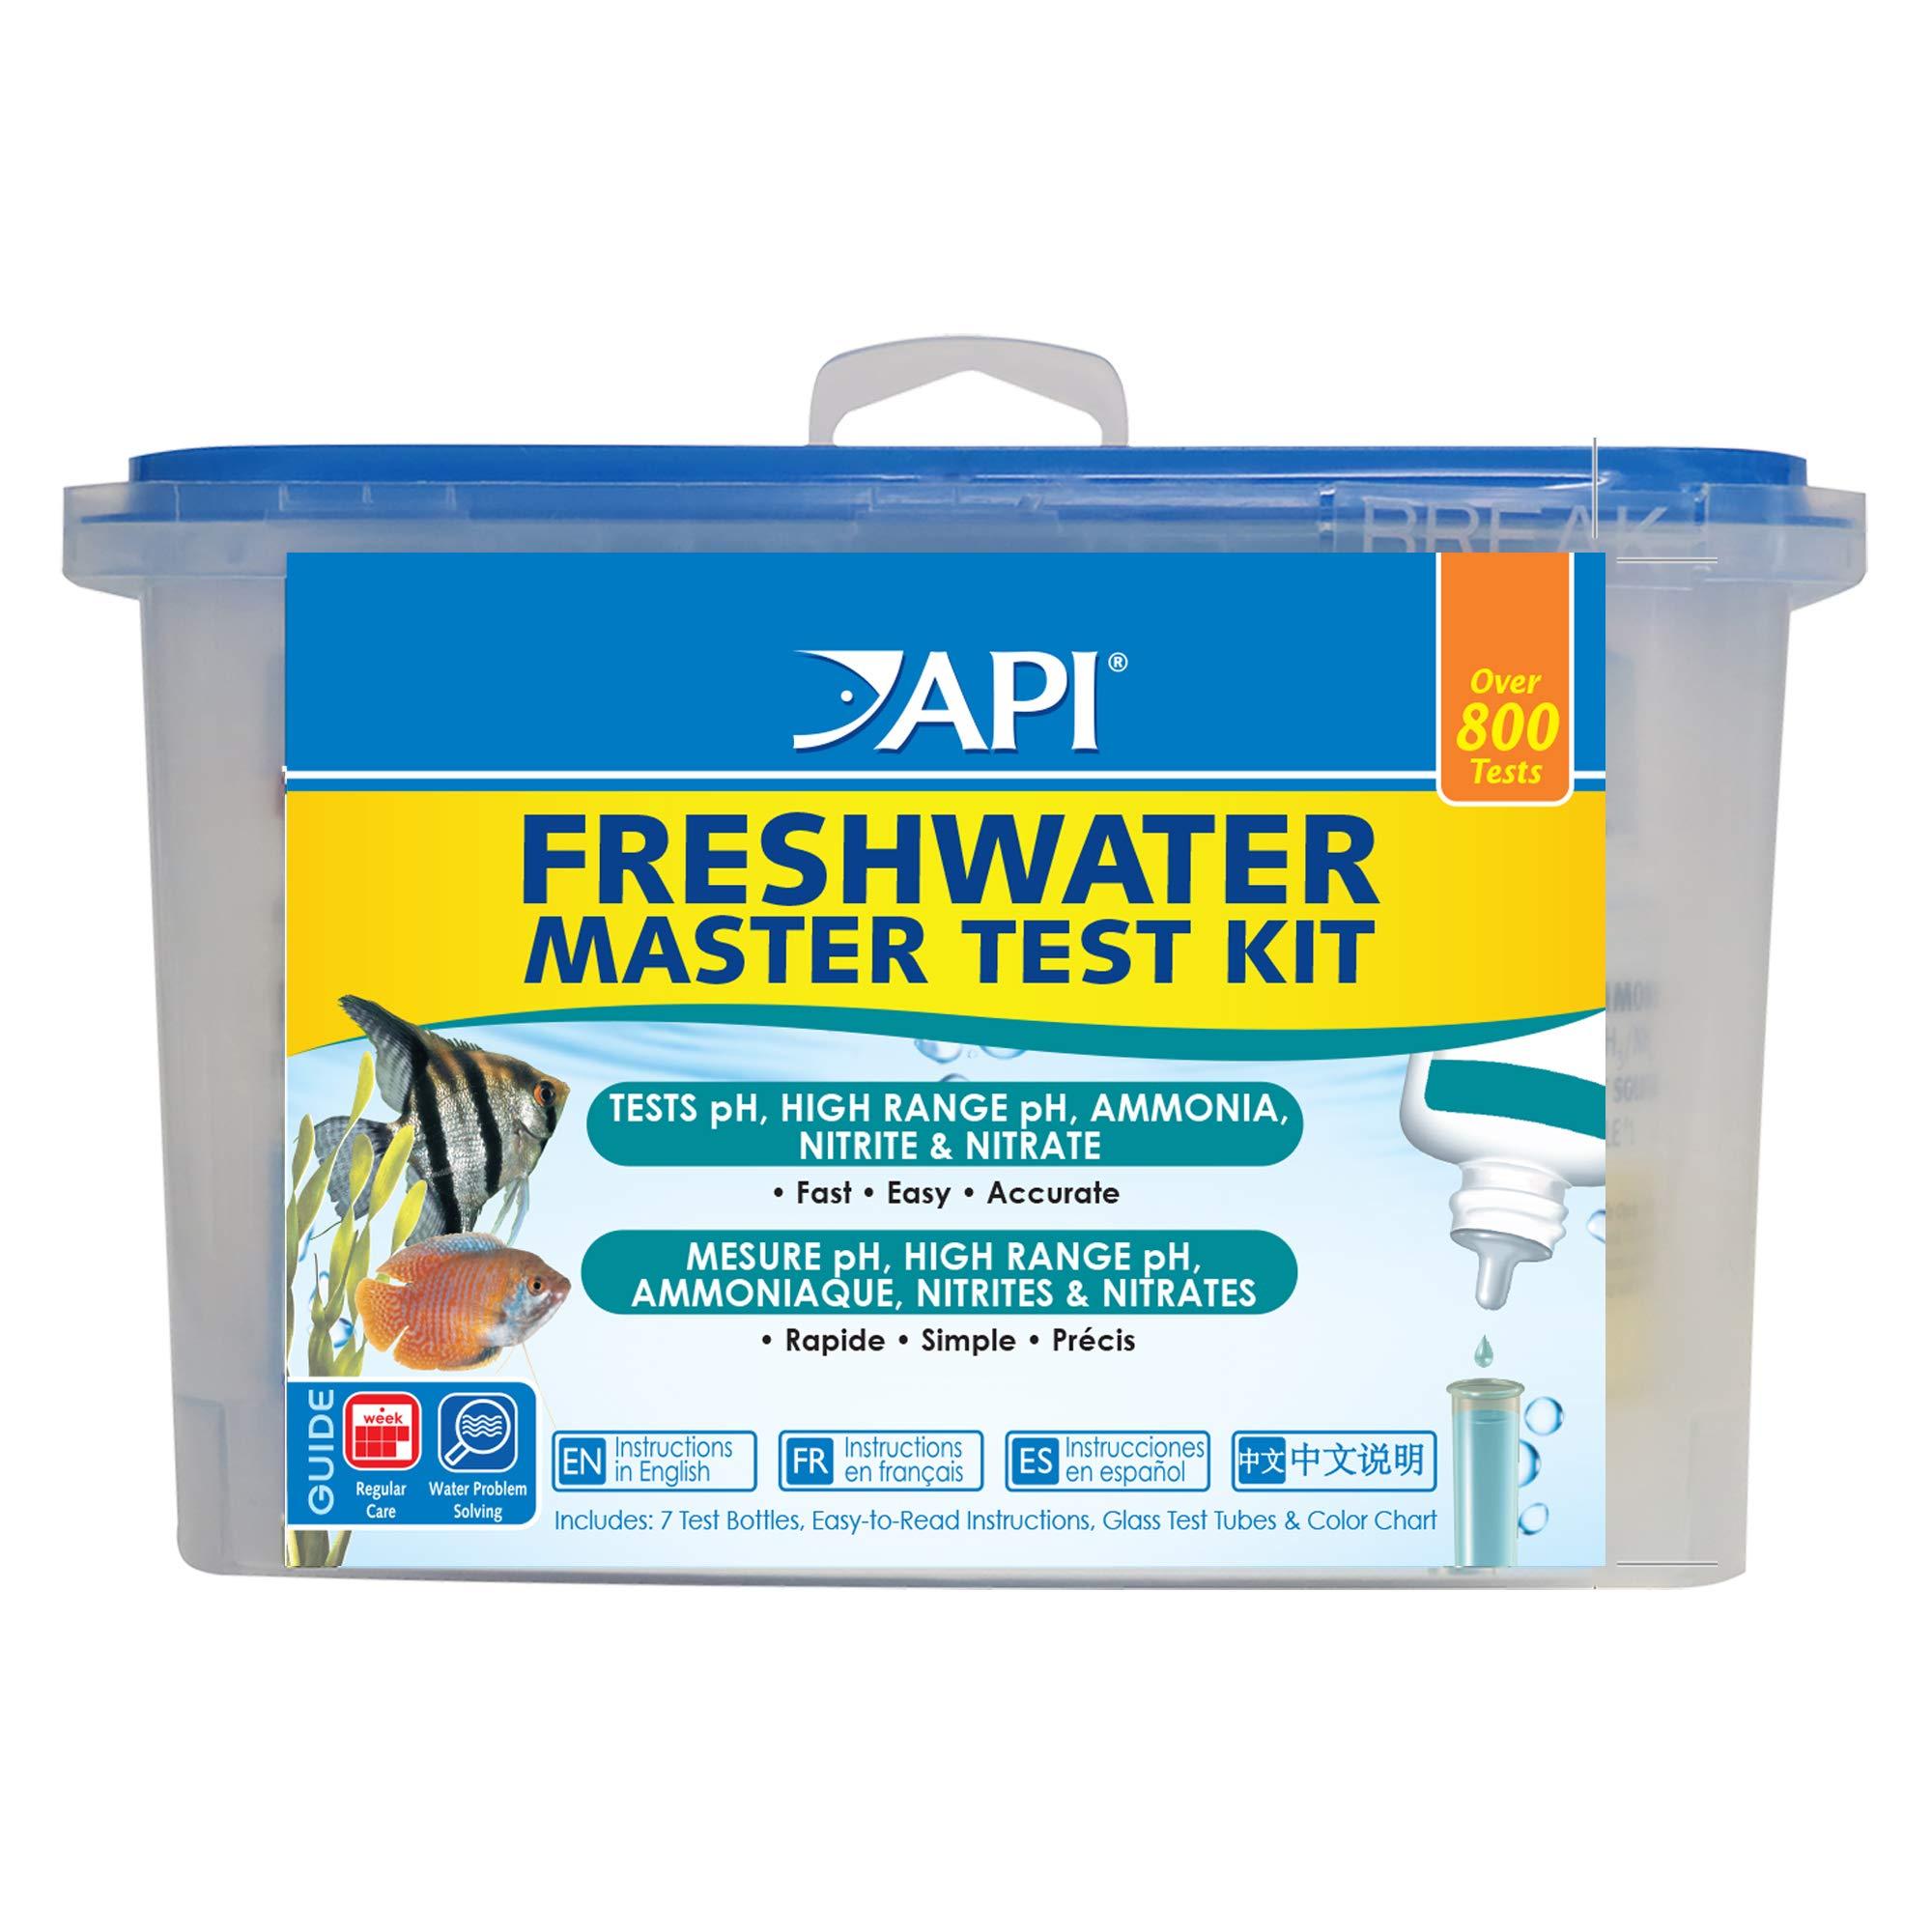 API FRESHWATER MASTER TEST KIT 800-Test Freshwater Aquarium Water Master Test Kit by API